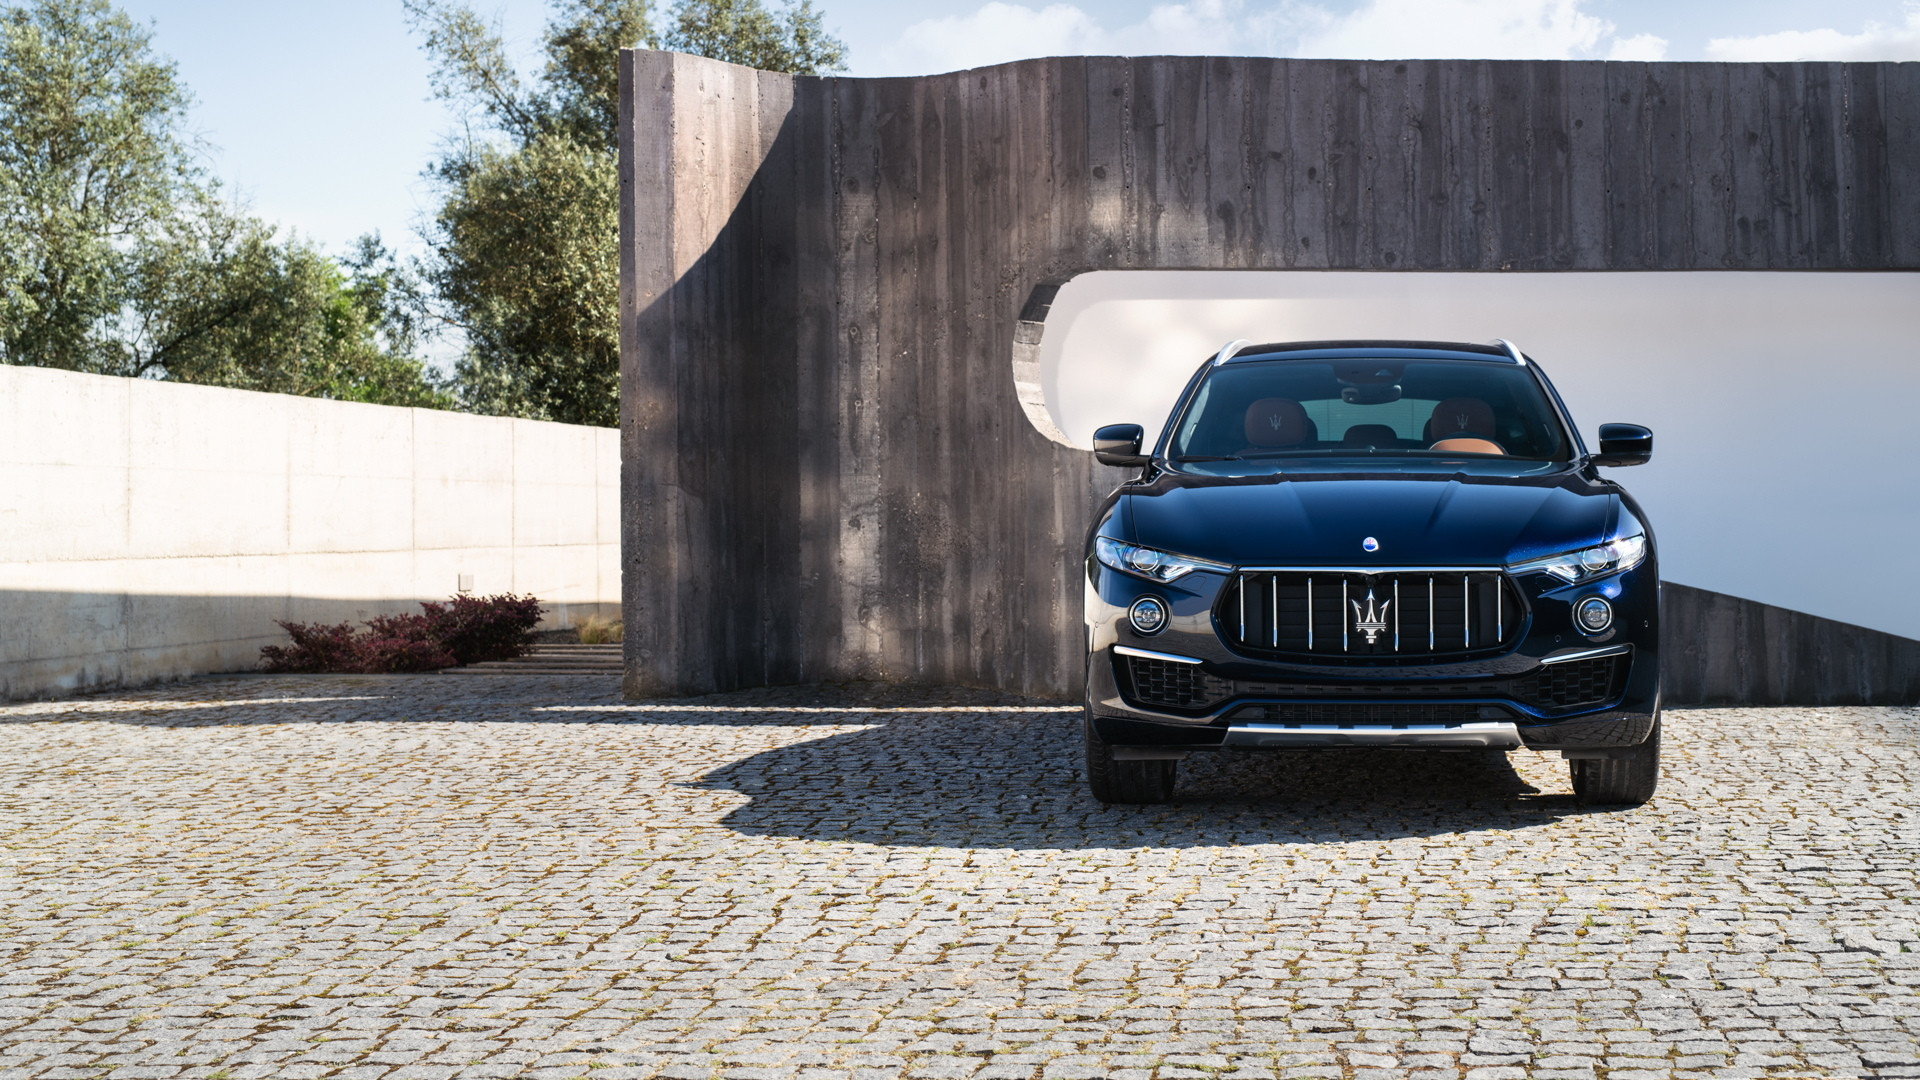 Maserati-MY19-Levante-GranLusso-181860M.jpg